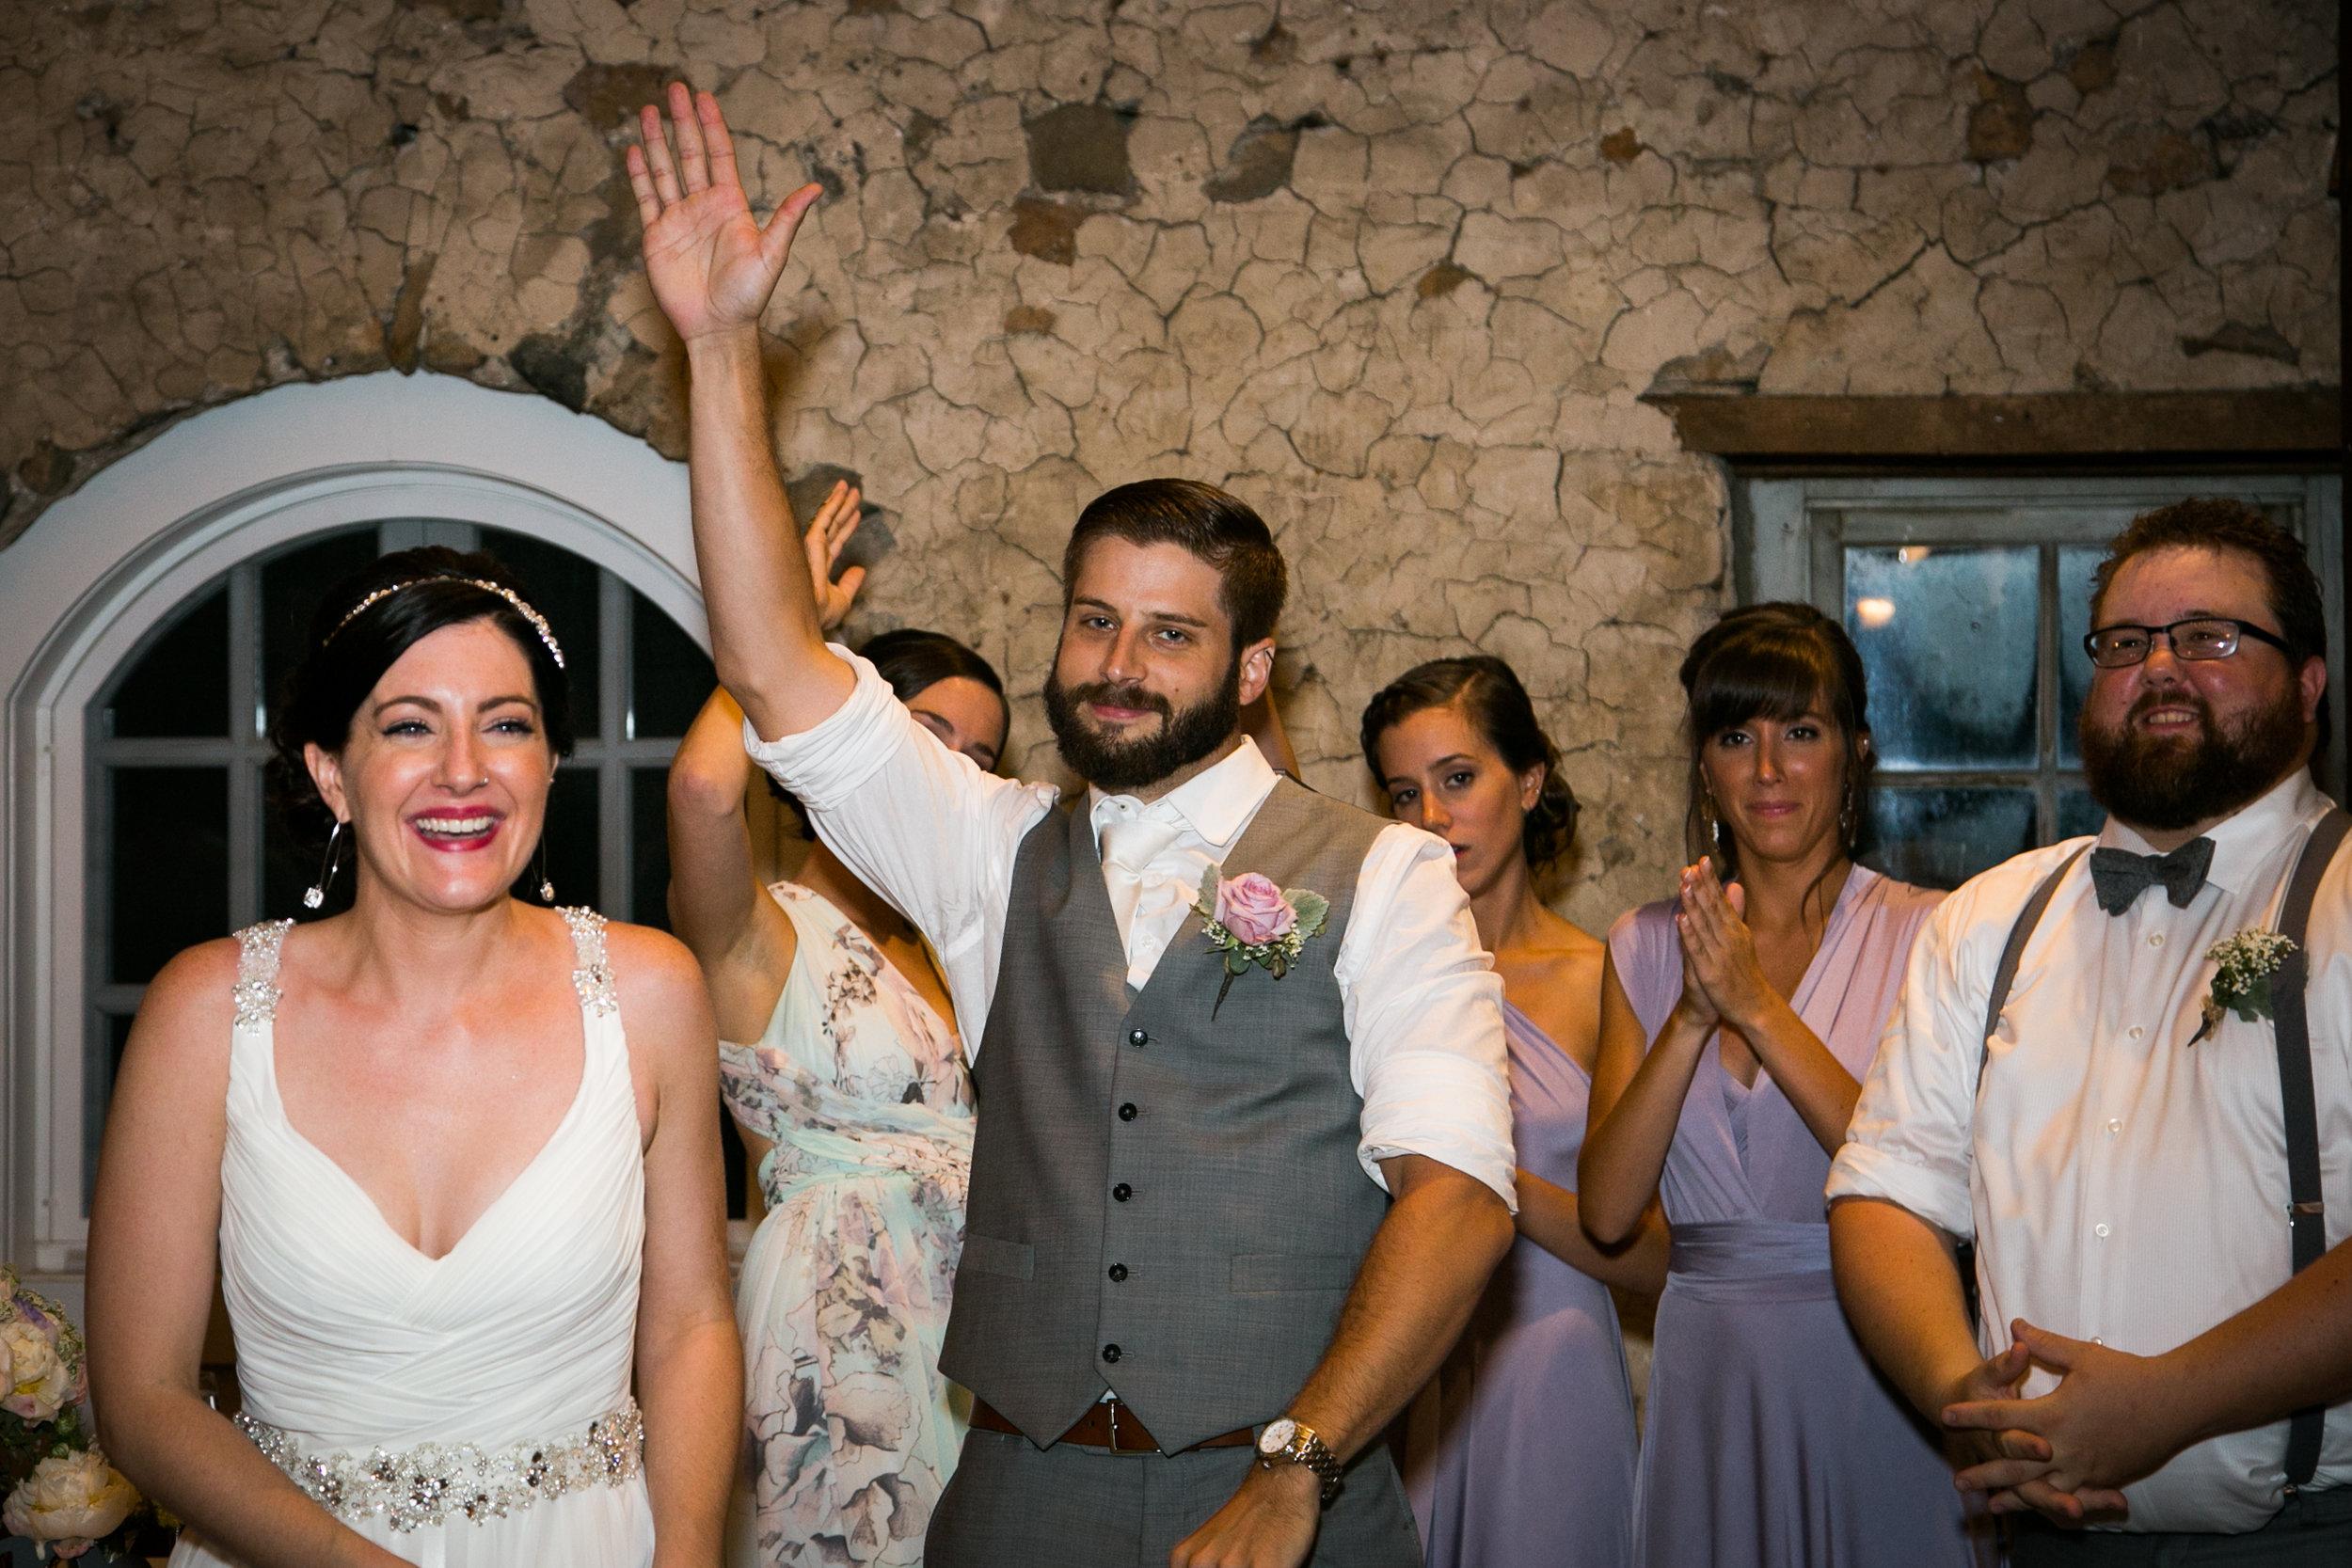 TYLER ARBORETUM WEDDING PHOTOGRAPHY LOVESTRUCK PICTURES-078.jpg